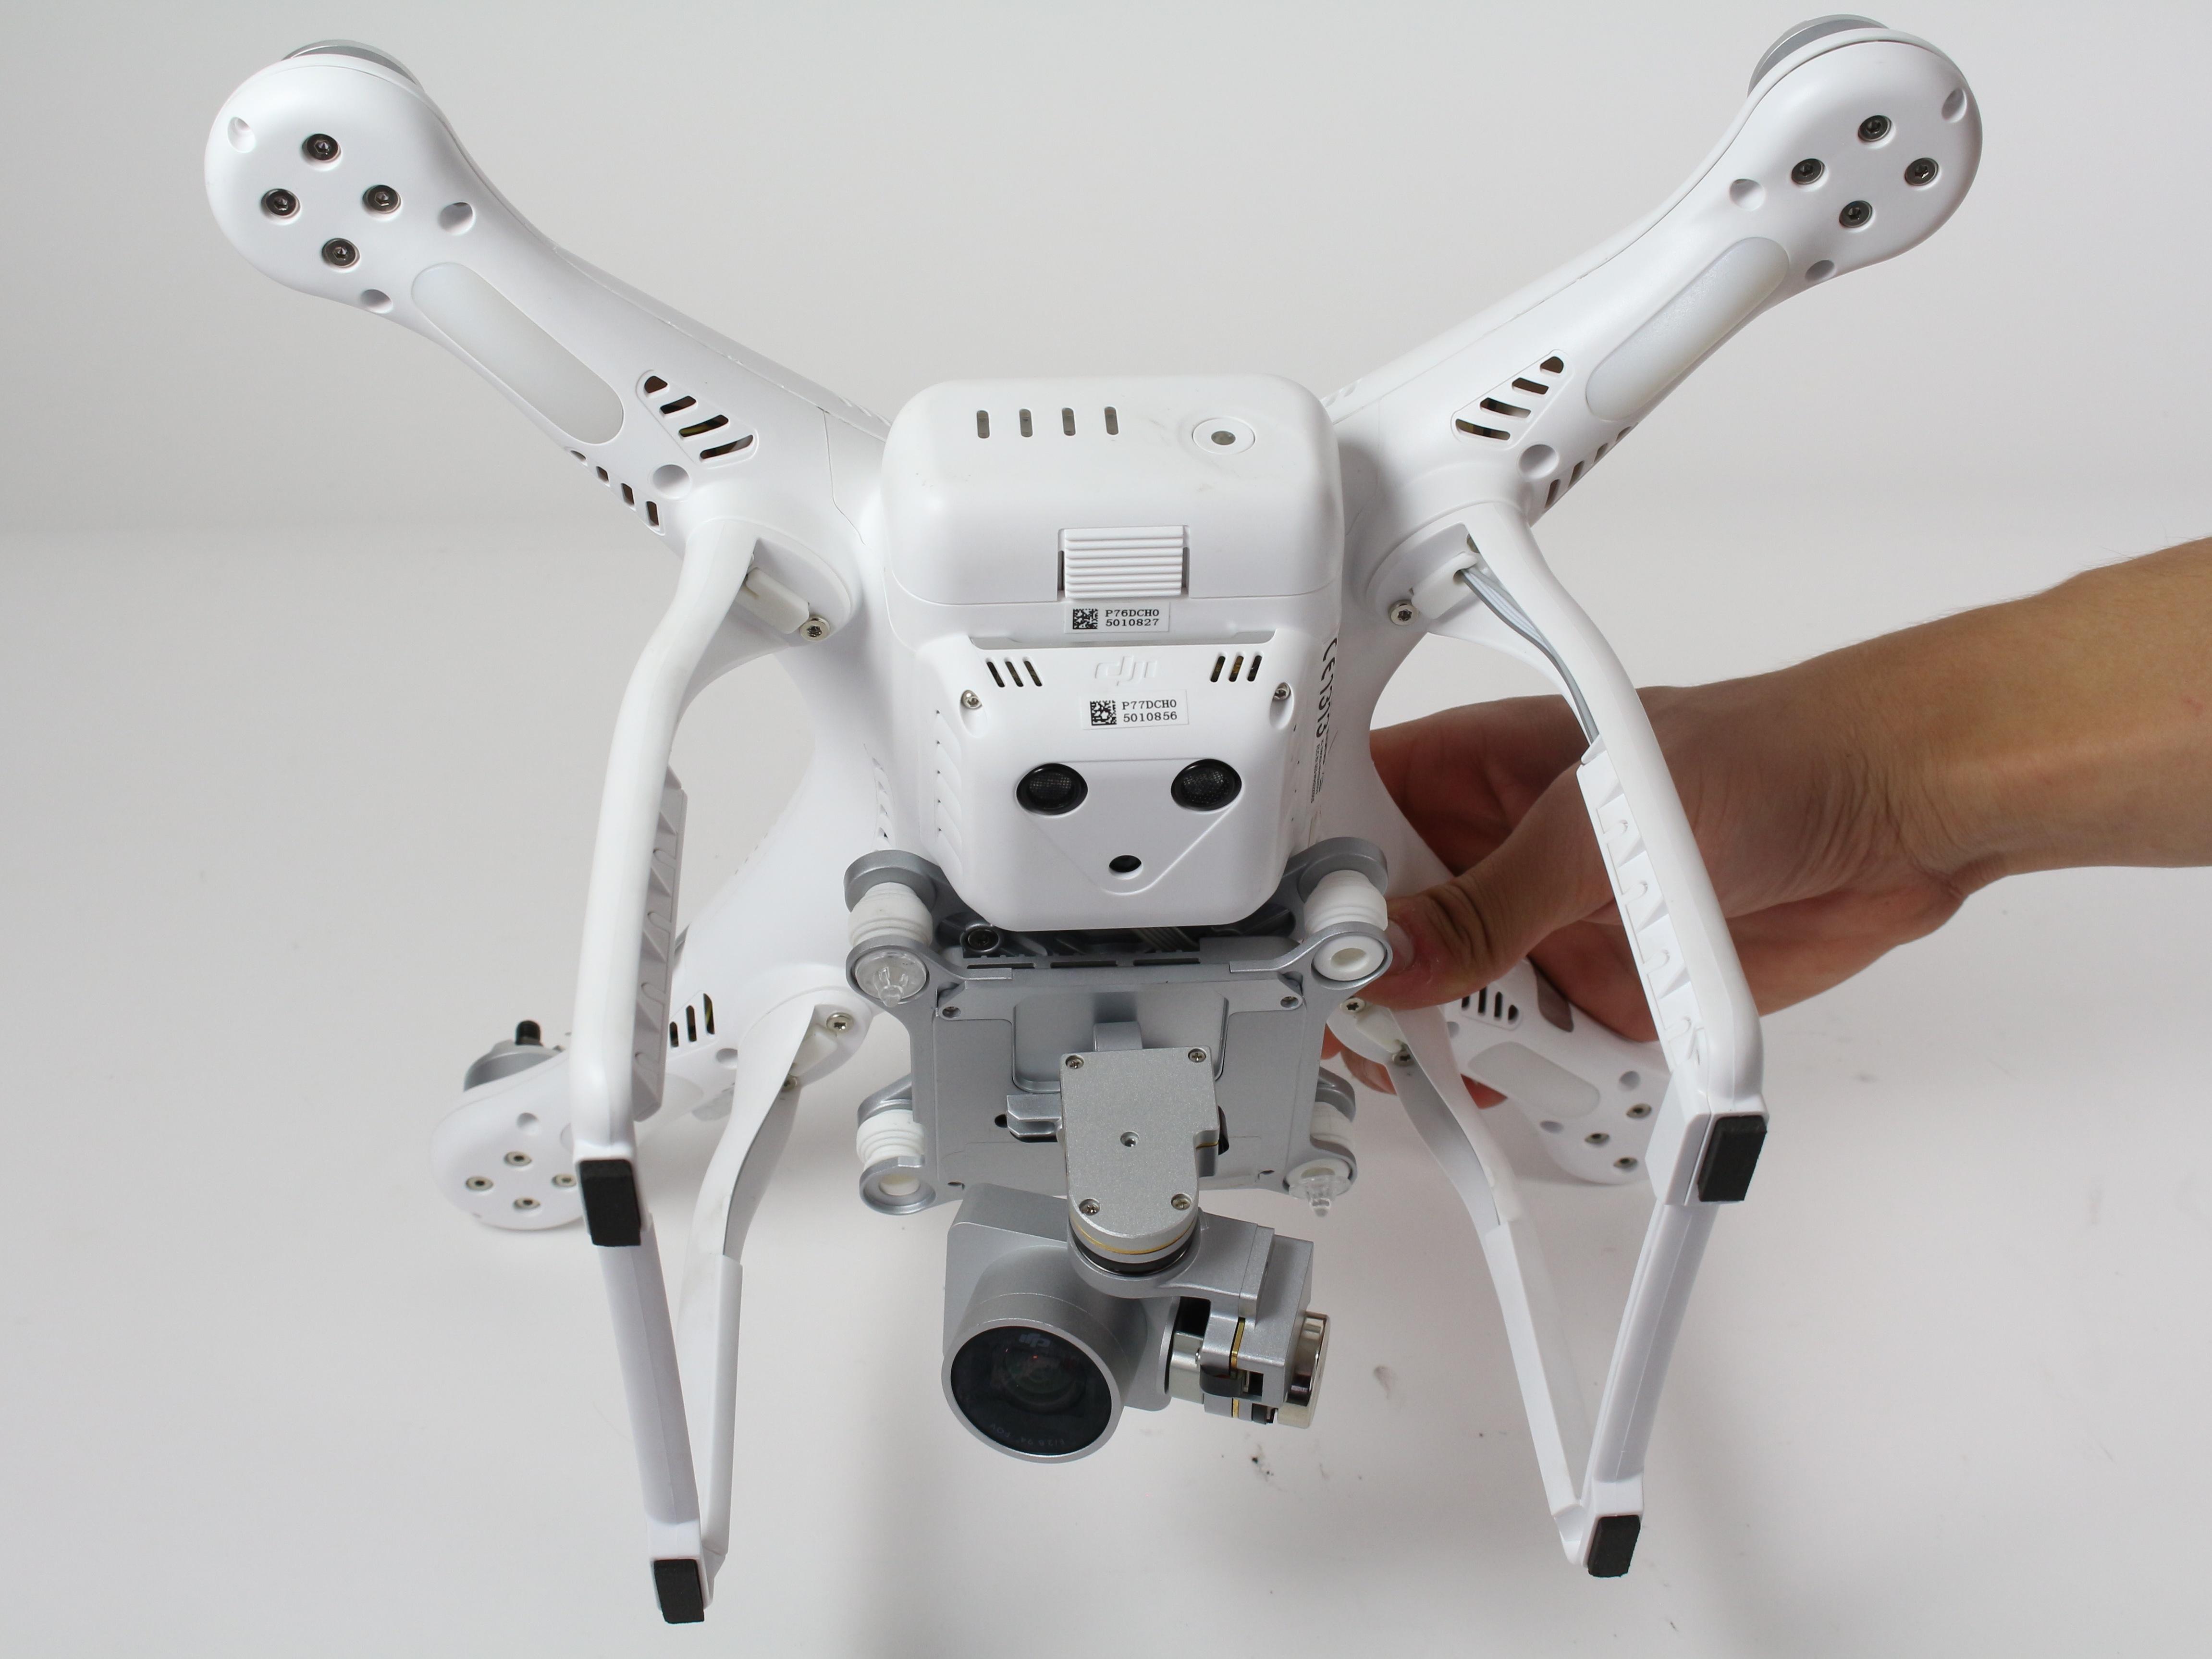 Dji Phantom 3 Advanced Repair Ifixit Quadcopter Gimbal Wiring Diagram Motor Replacement